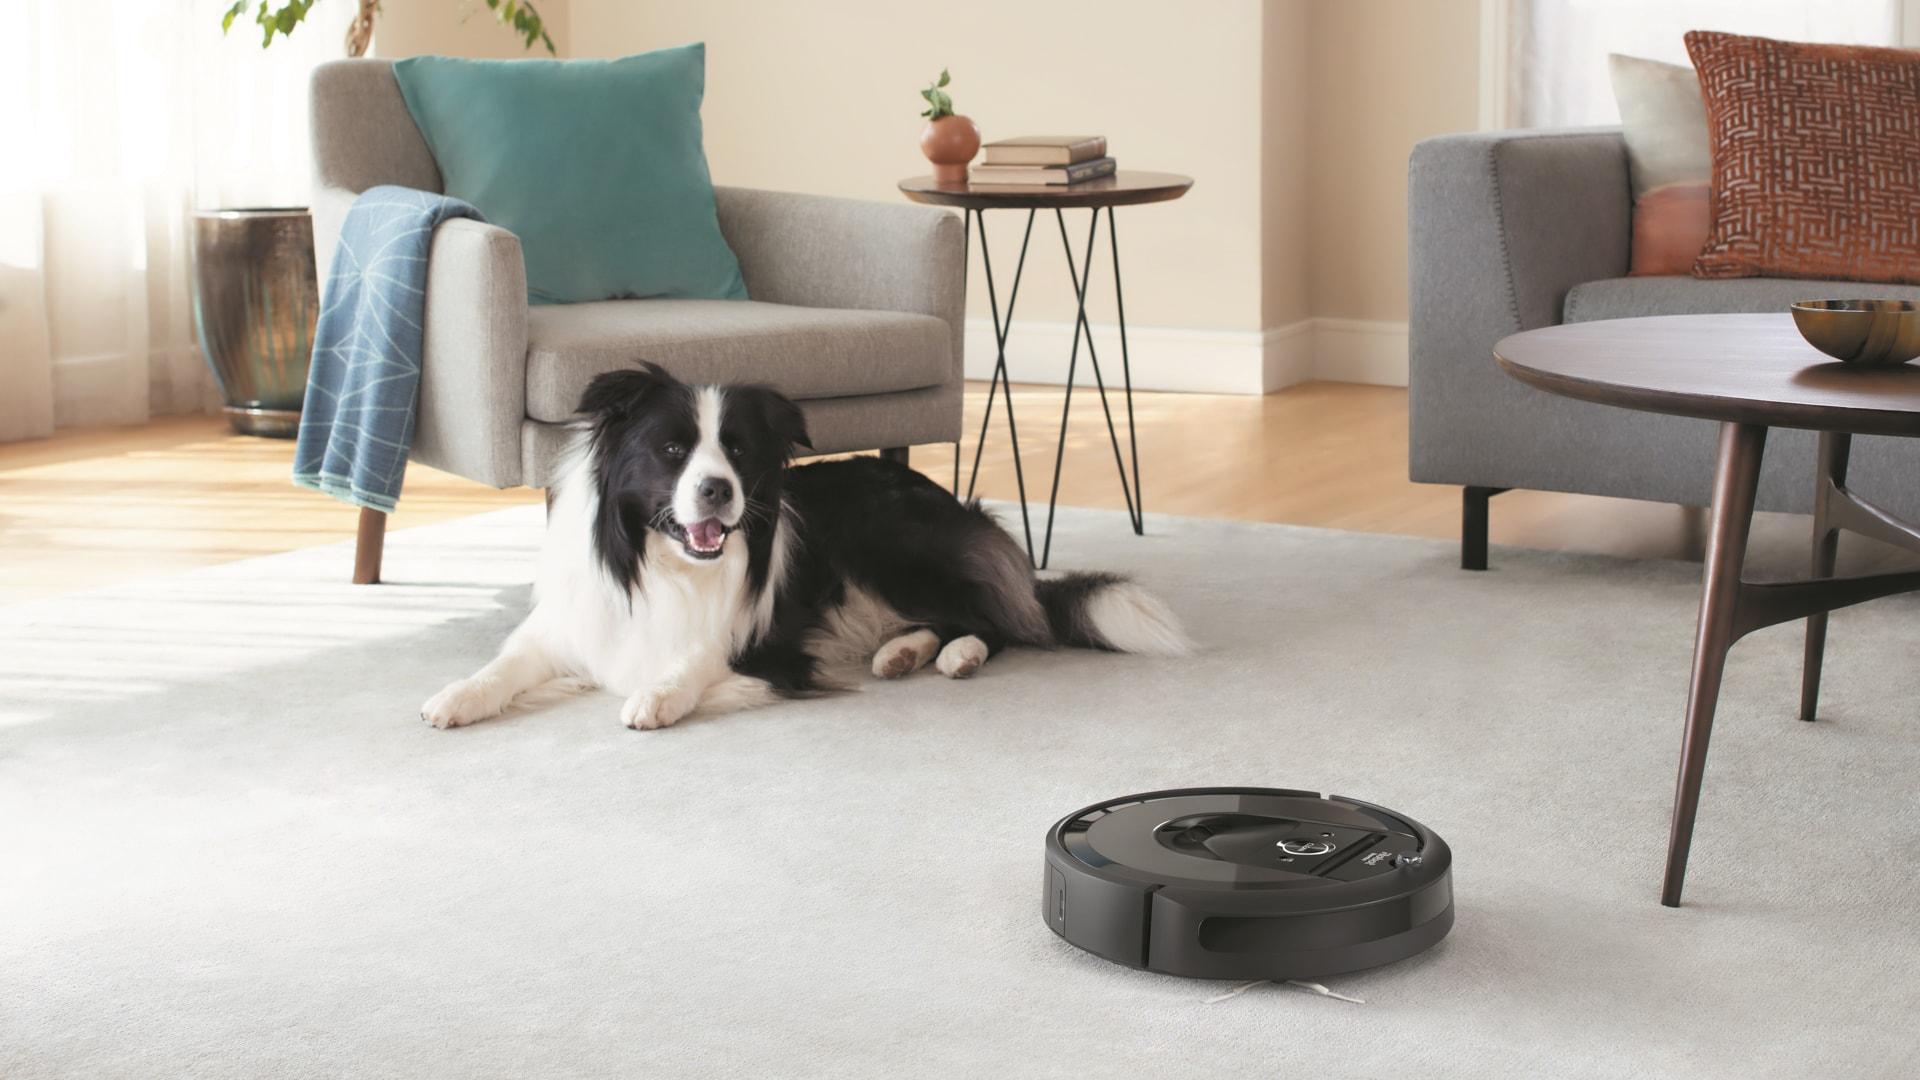 iRobot Roomba Vacuum Dog in Livingroom